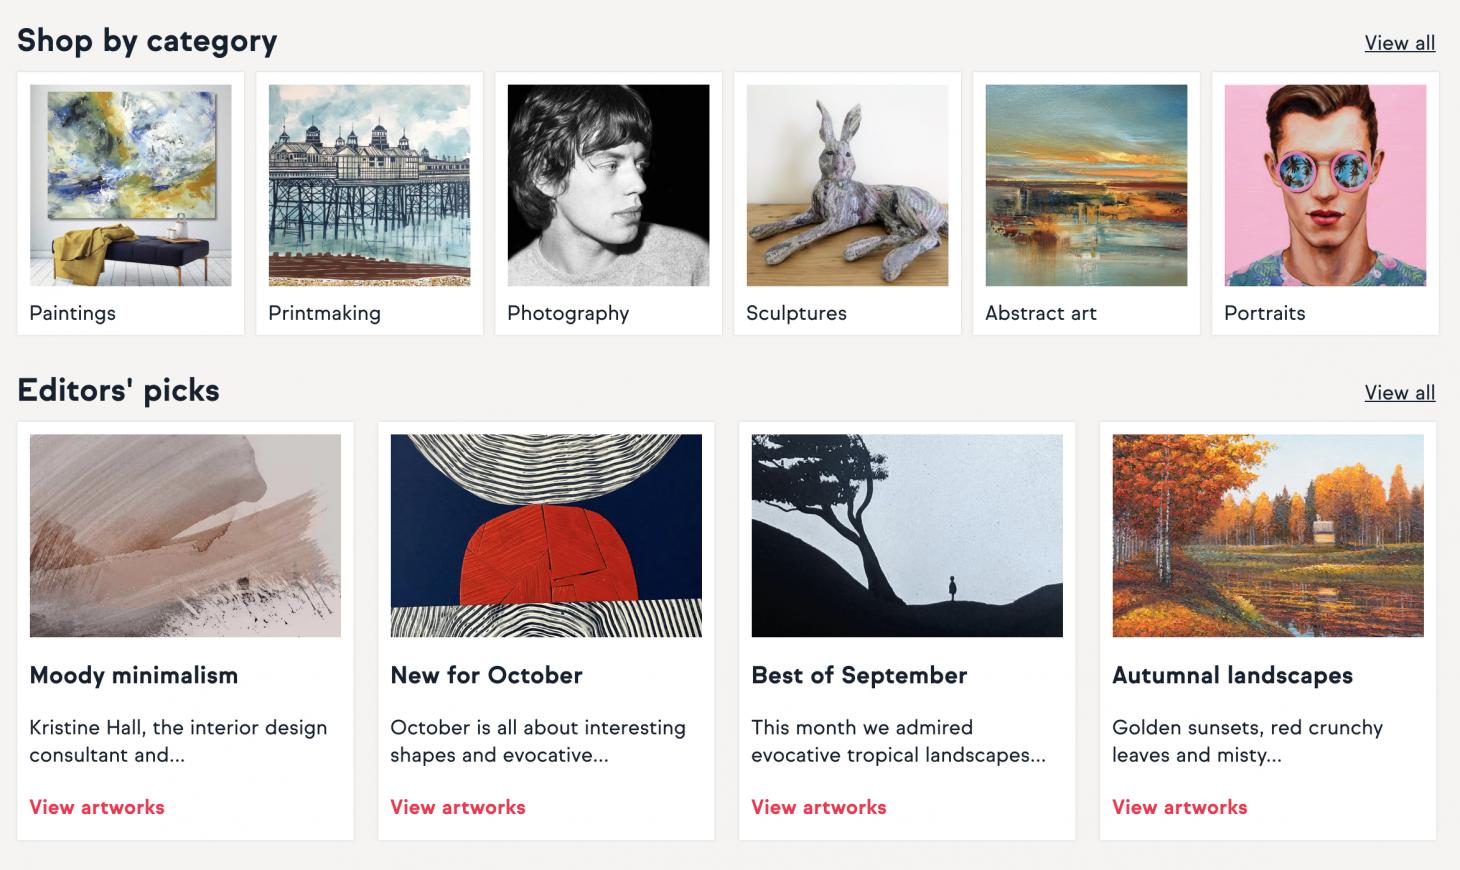 Artfinder shopping categories screenshot